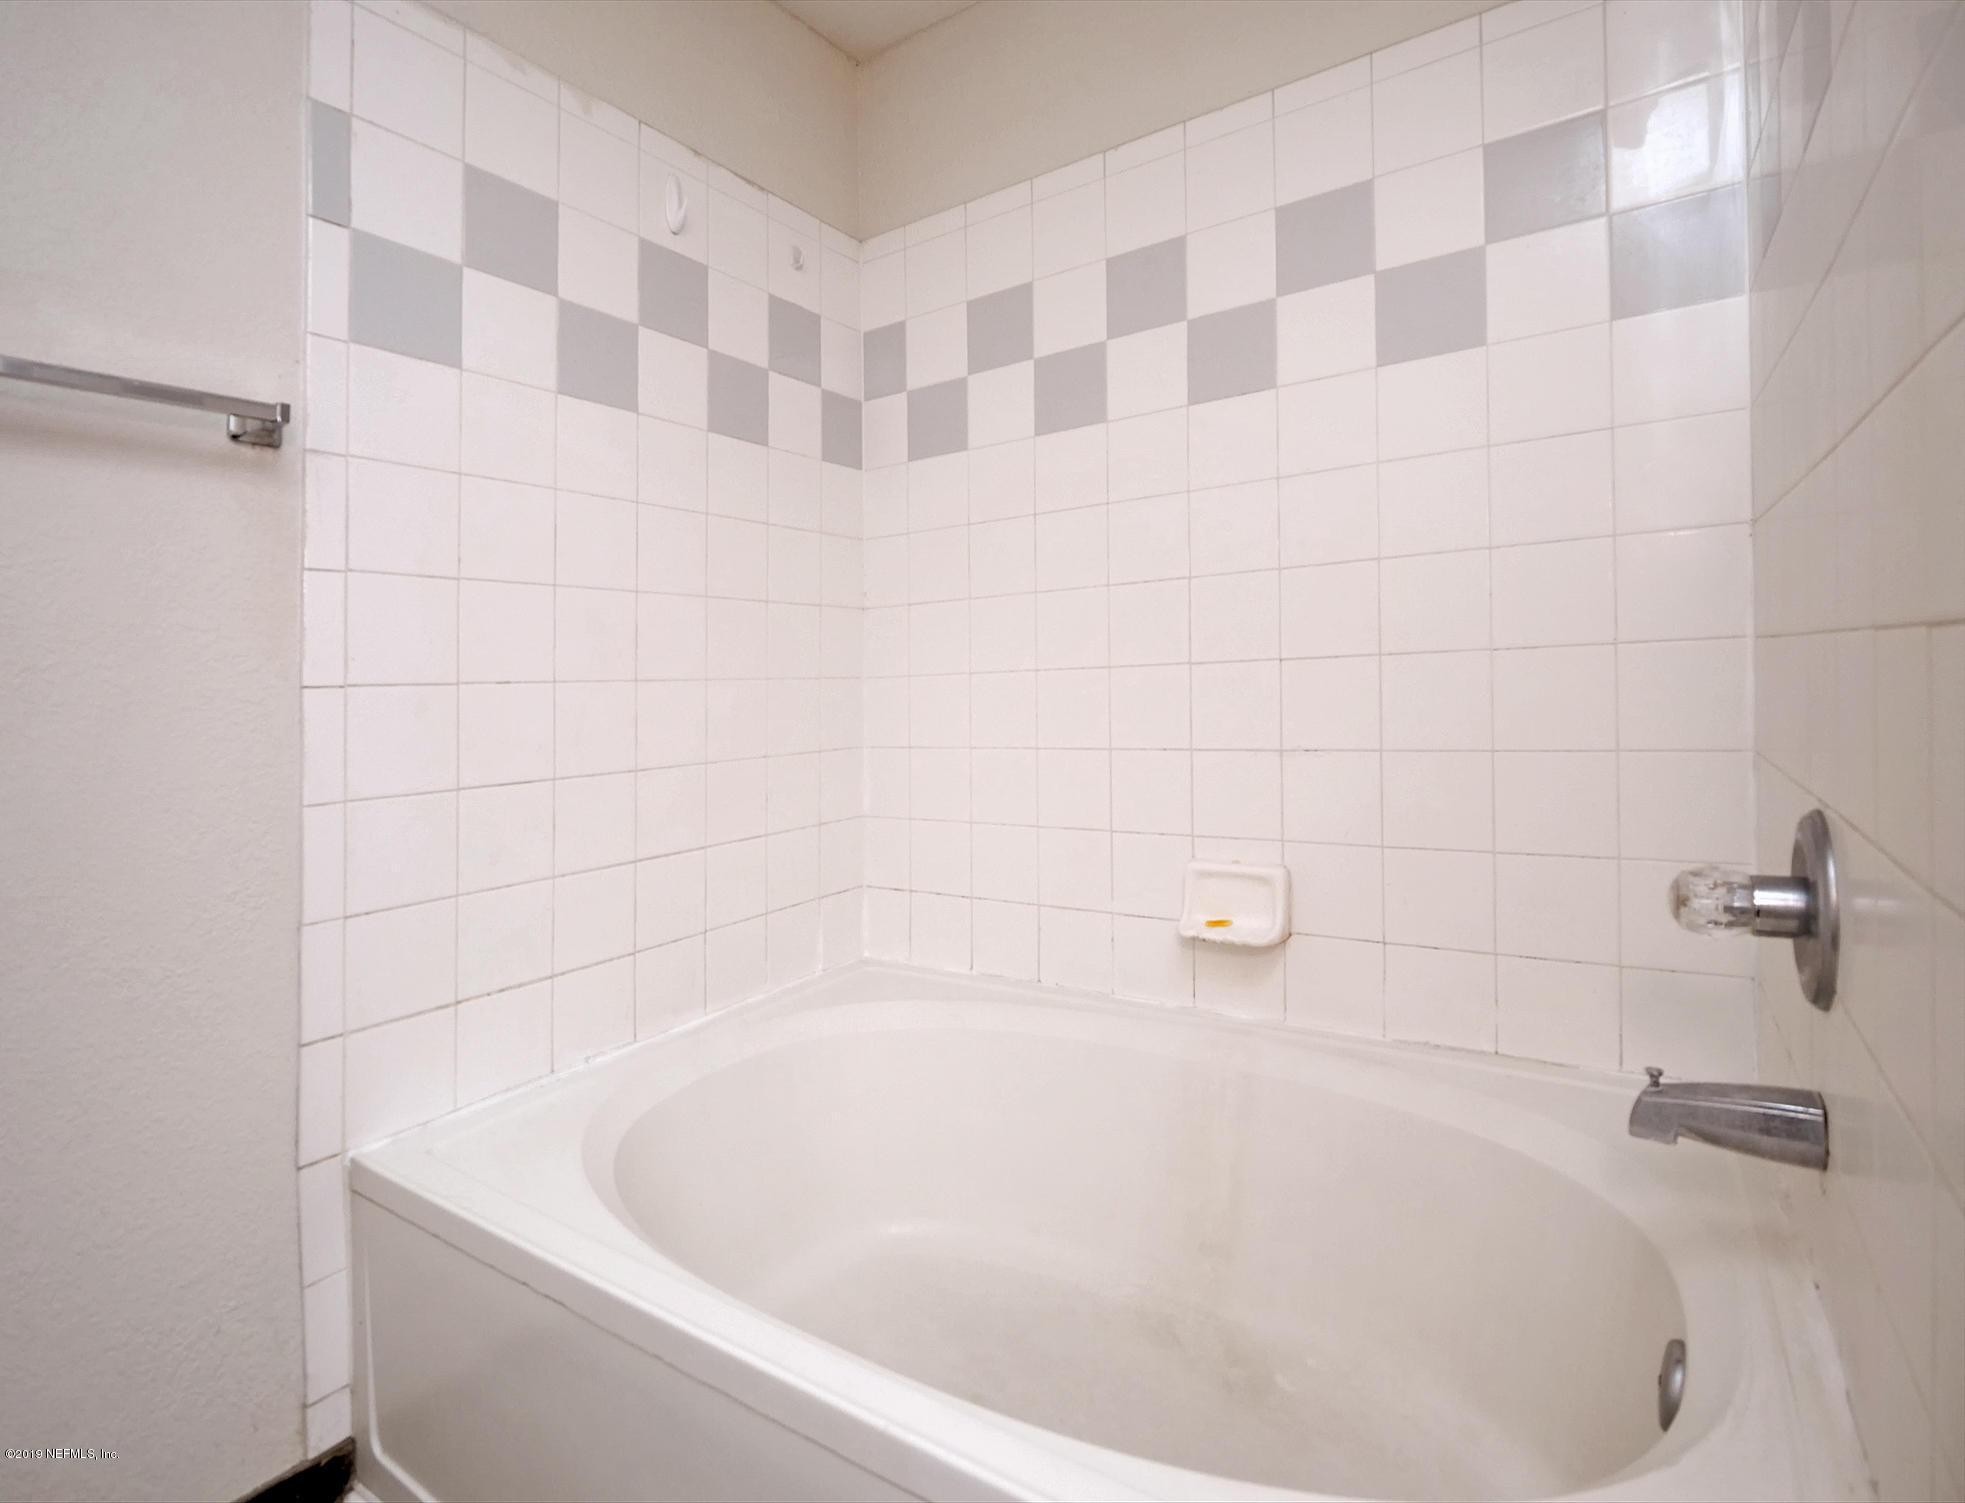 13810 SUTTON PARK, JACKSONVILLE, FLORIDA 32224, 1 Bedroom Bedrooms, ,1 BathroomBathrooms,Condo,For sale,SUTTON PARK,993536